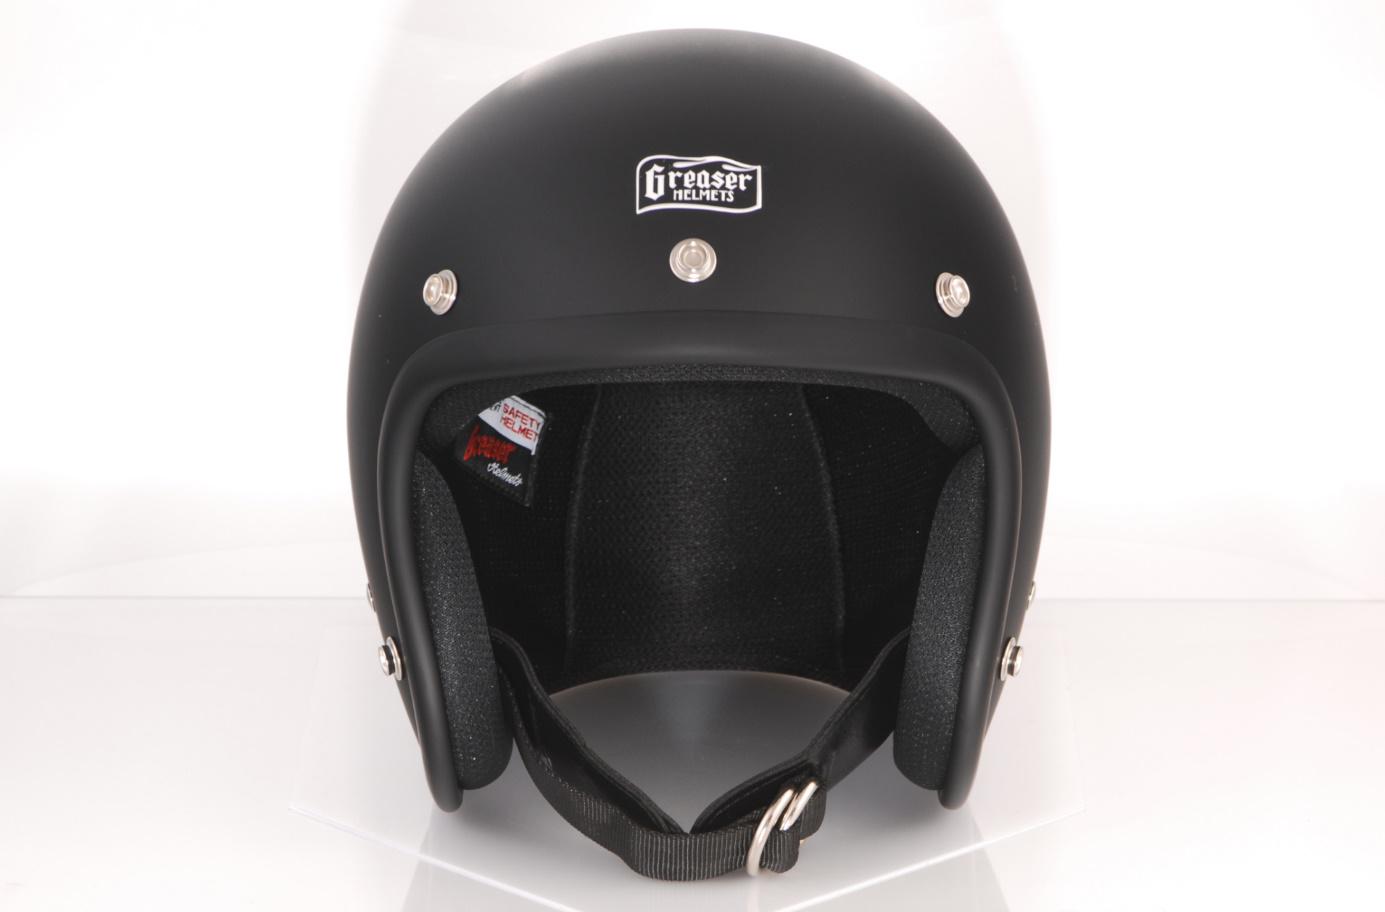 GREASER 60's PLAIN ジェットヘルメット マットブラック L(59cm~60cm) GREASER(グリーサー)